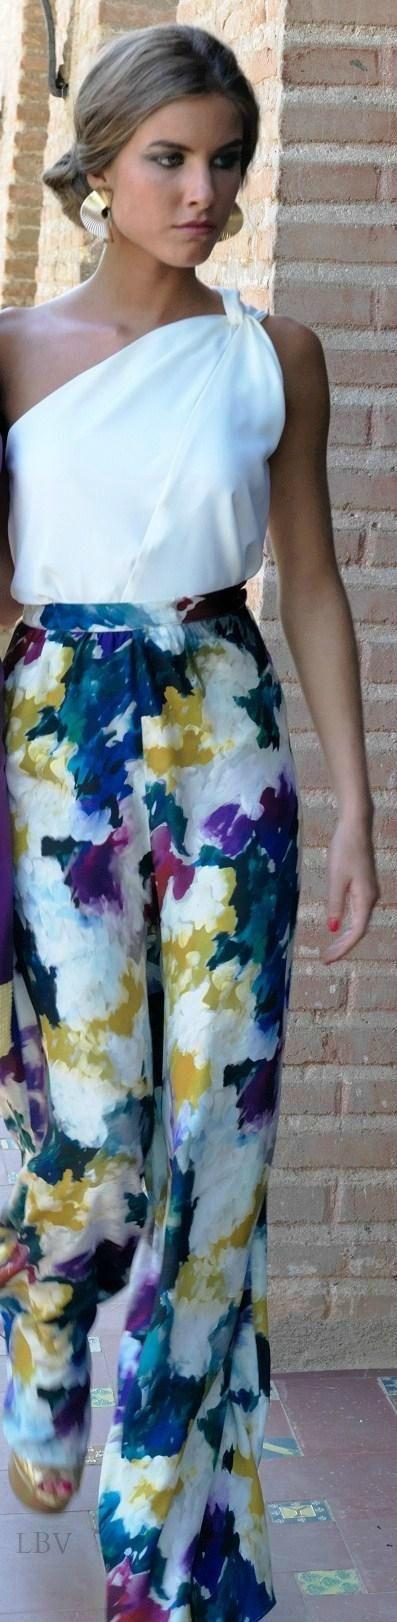 Floral fashion | LBV ♥✤